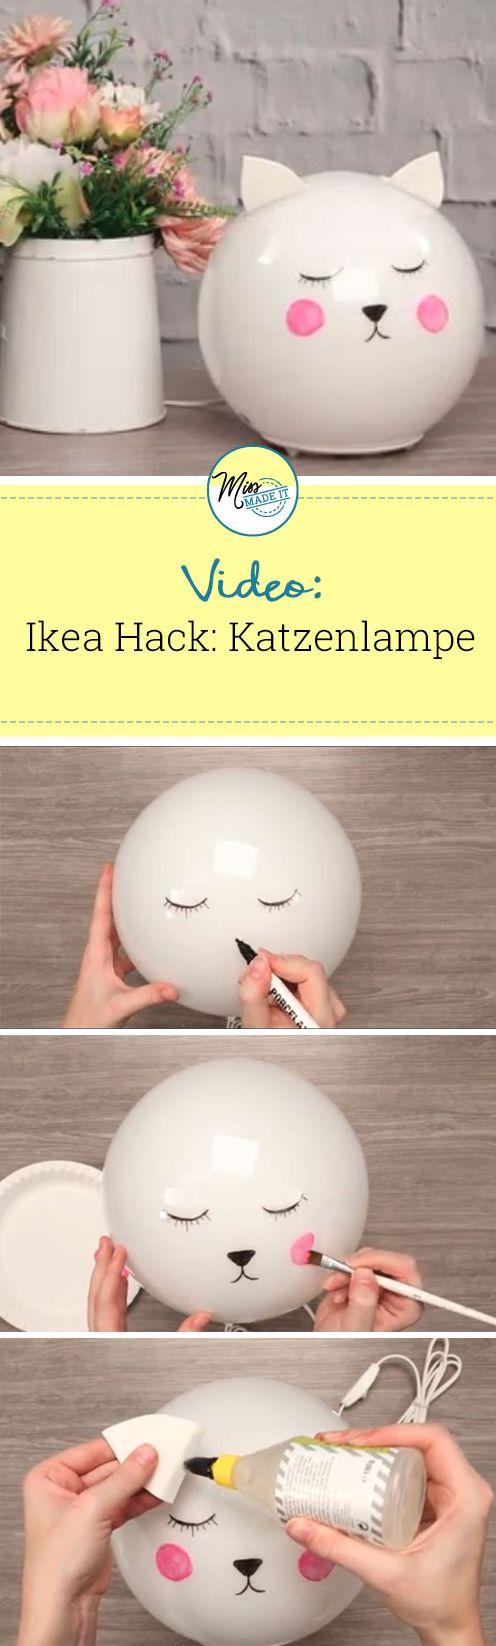 so verwandelst du die ikea fado lampe in eine katze ikea hacks basteln lampen und ikea. Black Bedroom Furniture Sets. Home Design Ideas